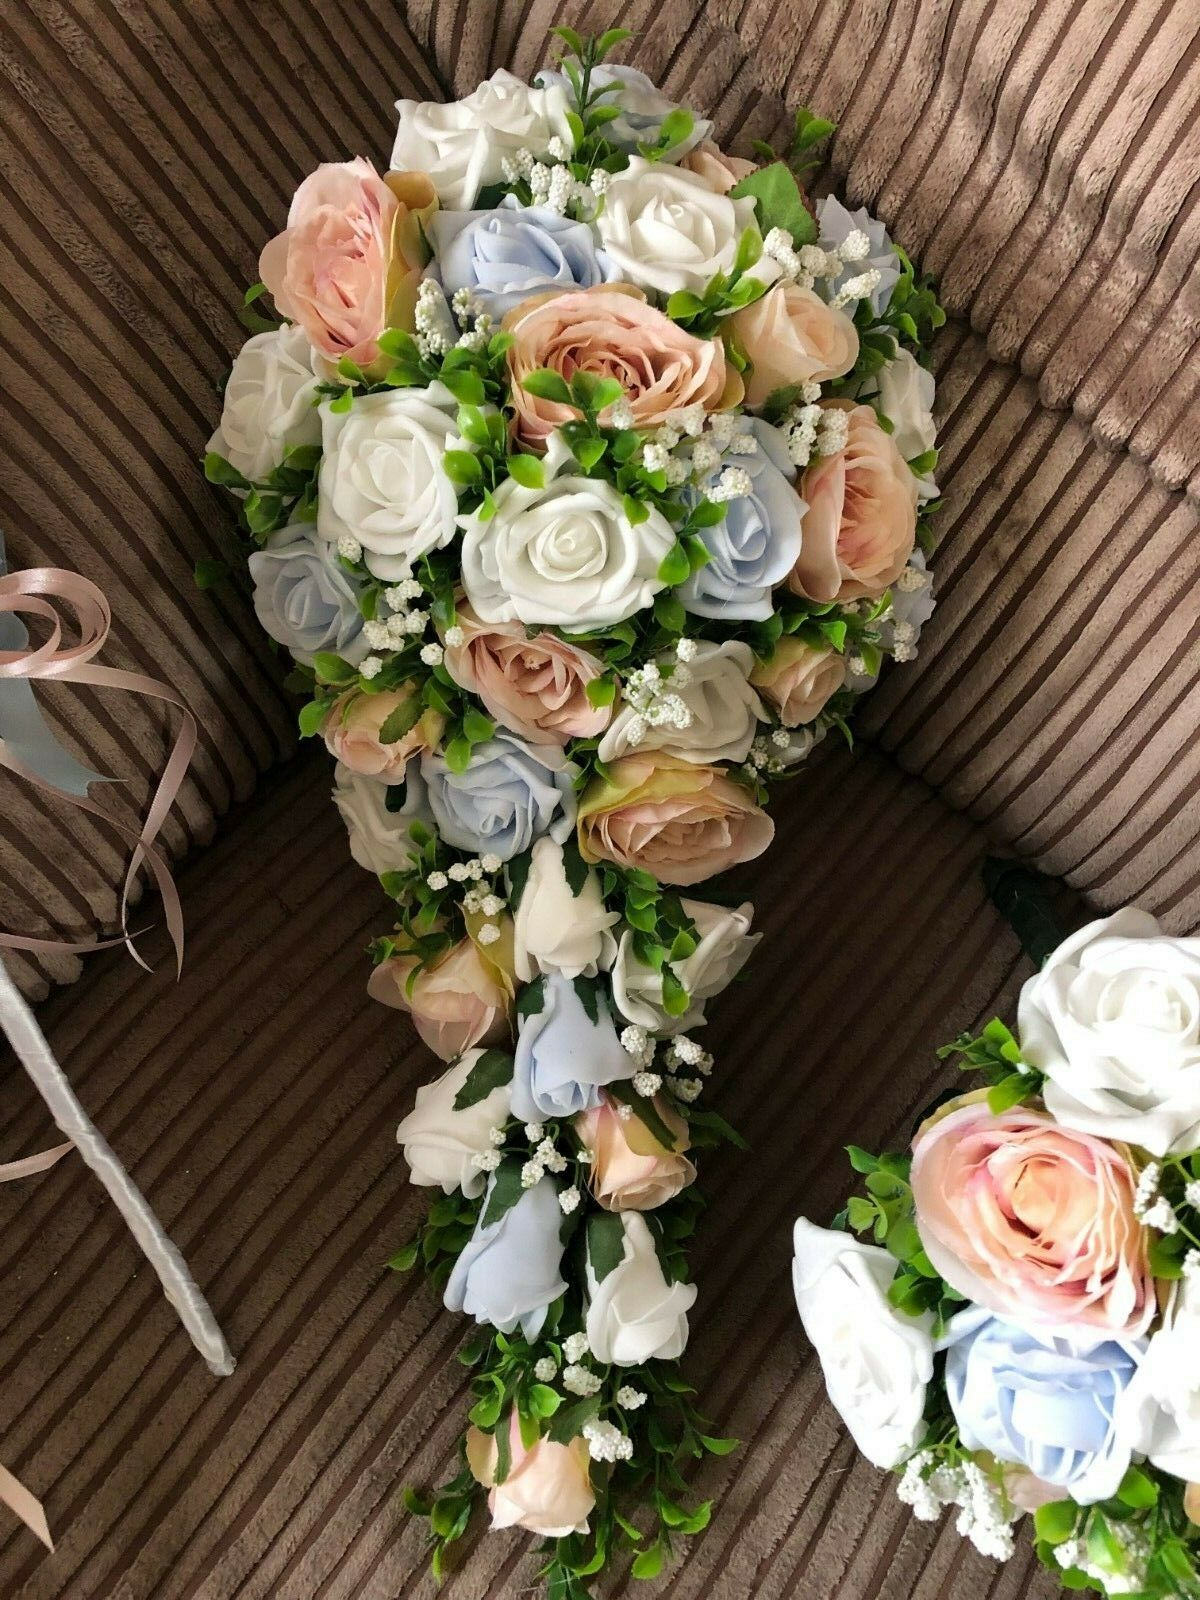 Mariage Fleurs XL Bridal Shower Bouquet Rose bleush Bleu & Blanc